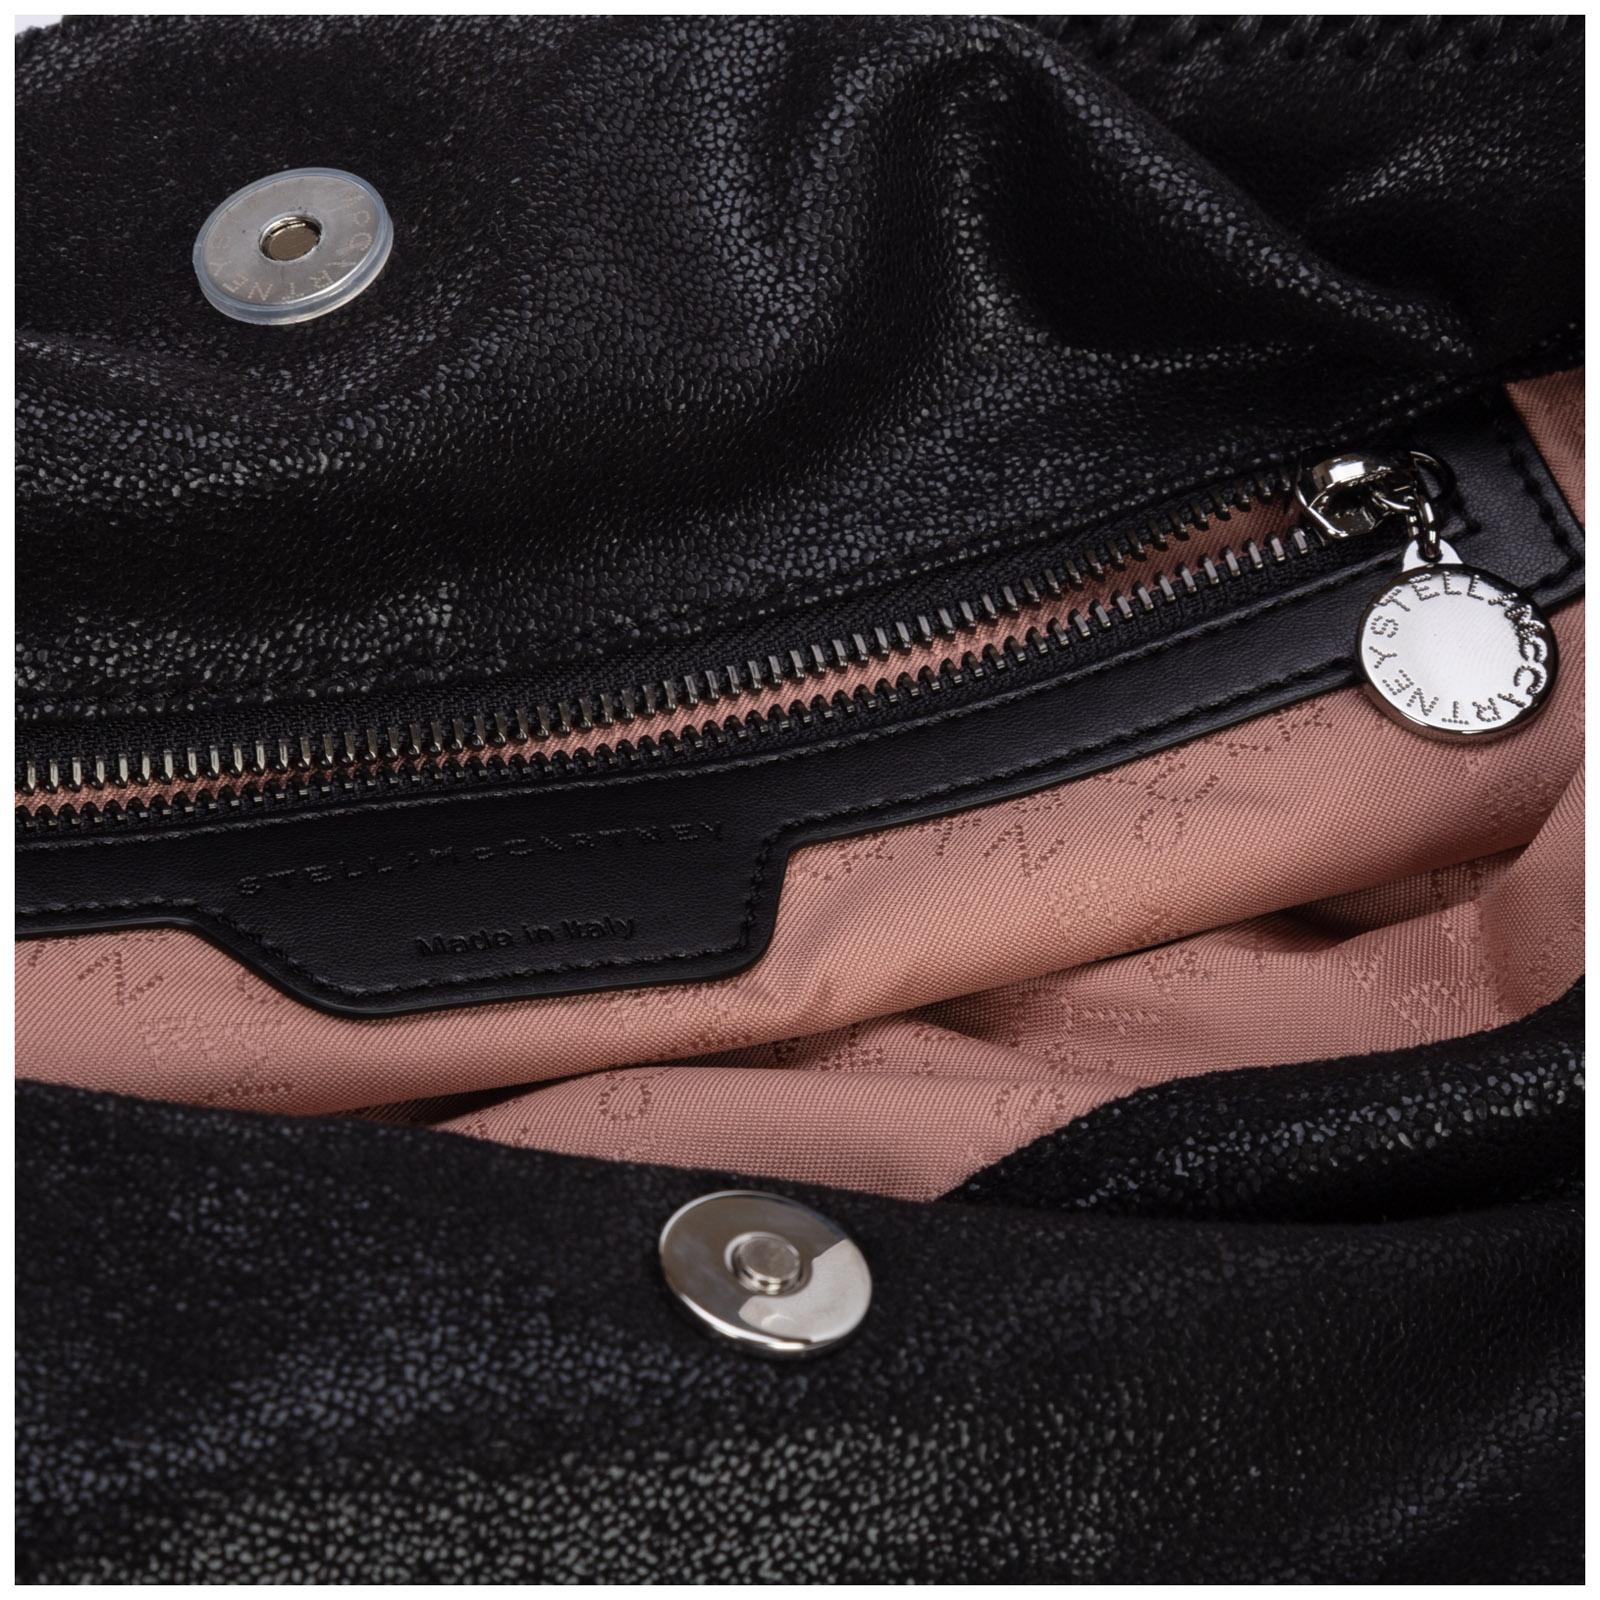 ... Women s handbag shopping bag purse falabella fold over shaggy deer ... d41c24bdf09b9